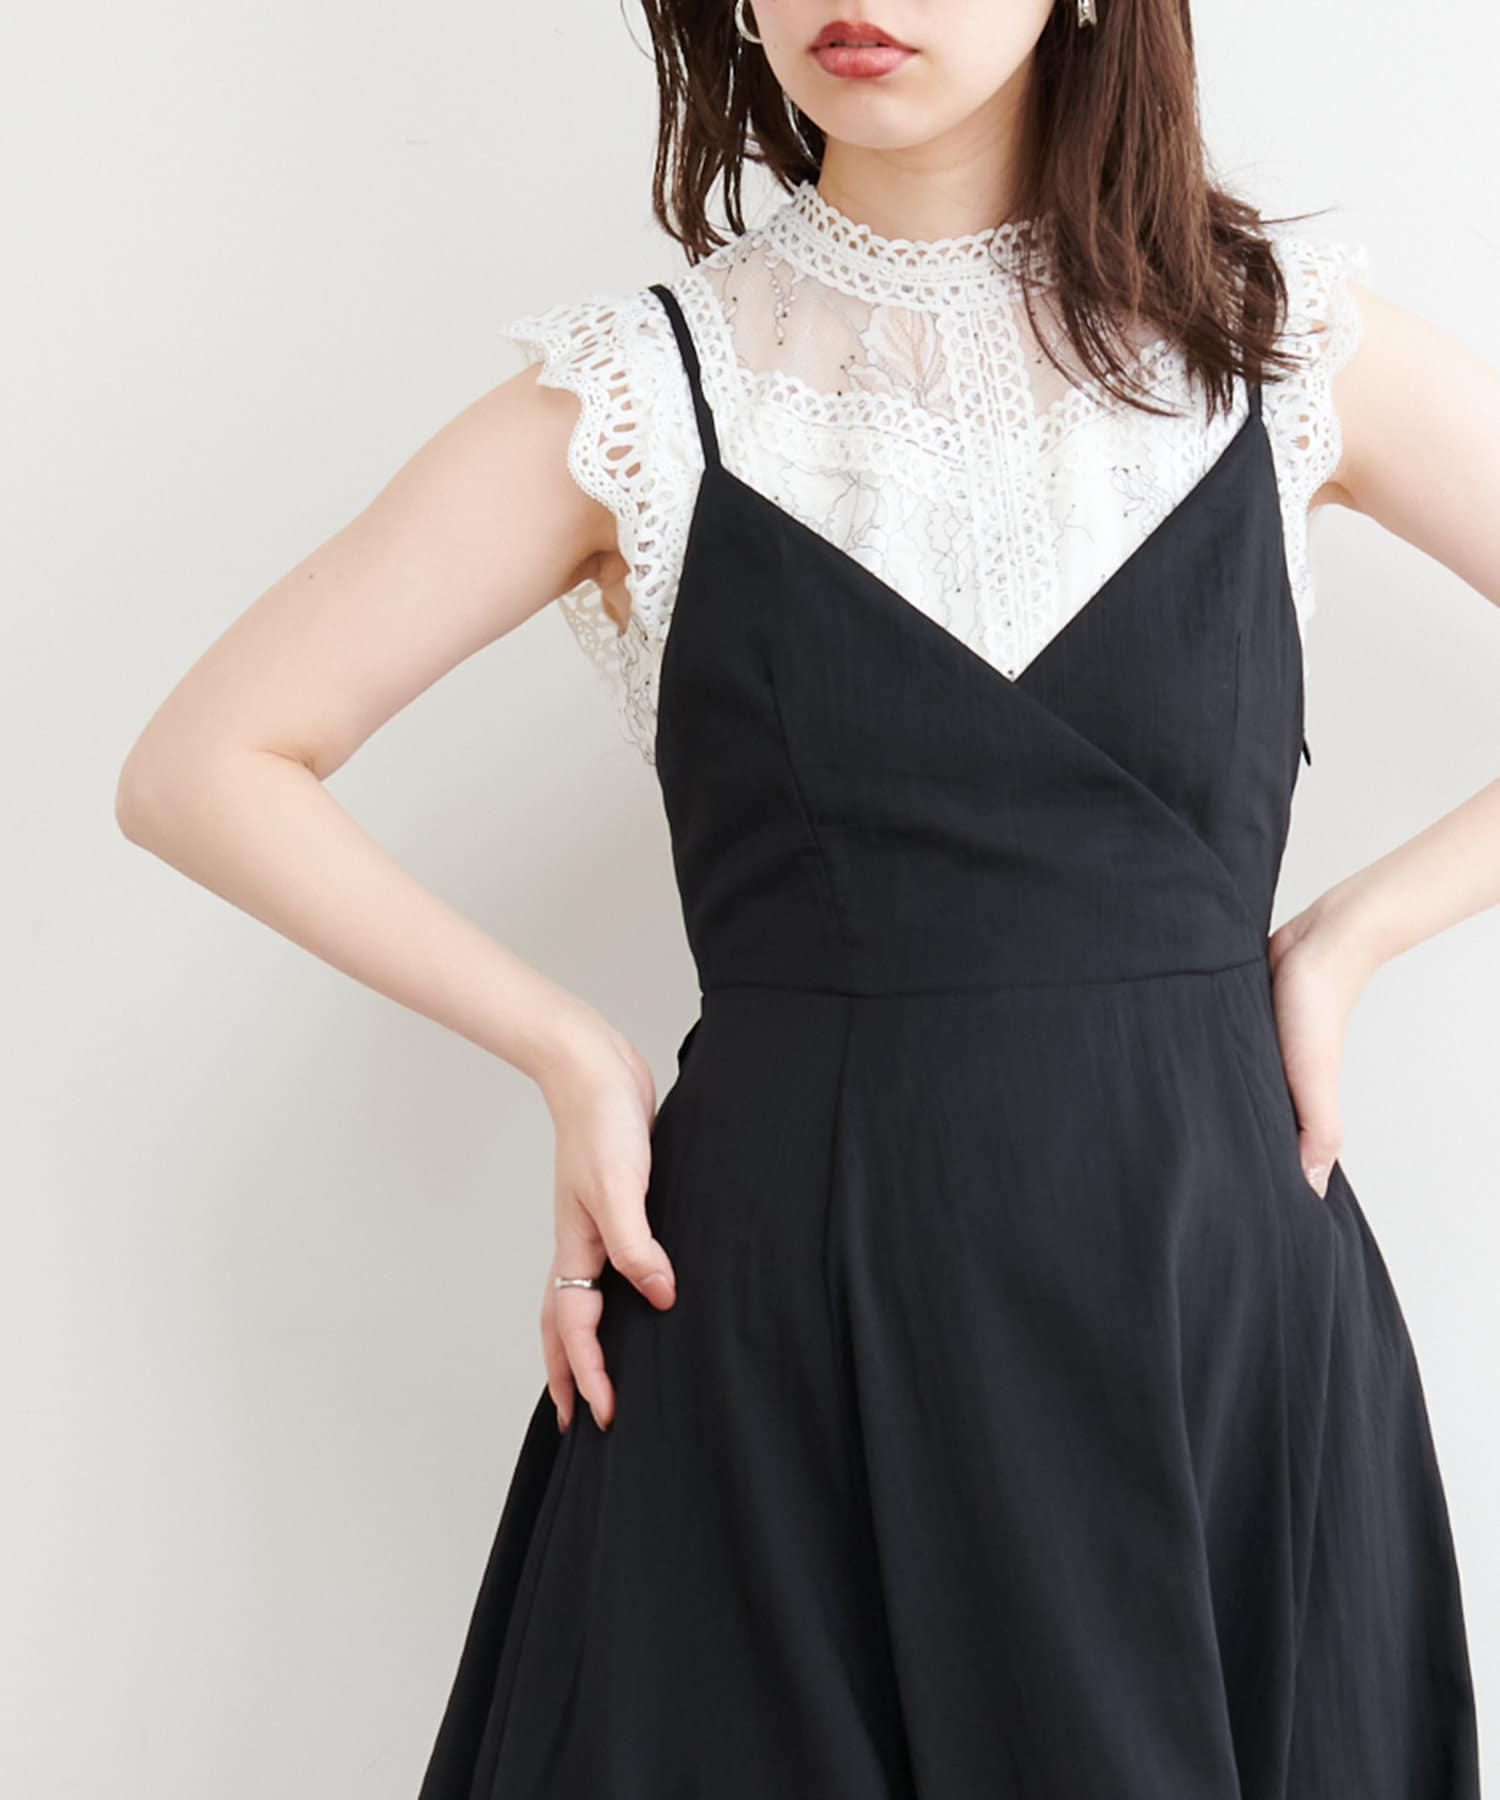 natural couture(ナチュラルクチュール) 【WEB限定】ノースリチュールレース切替ブラウス